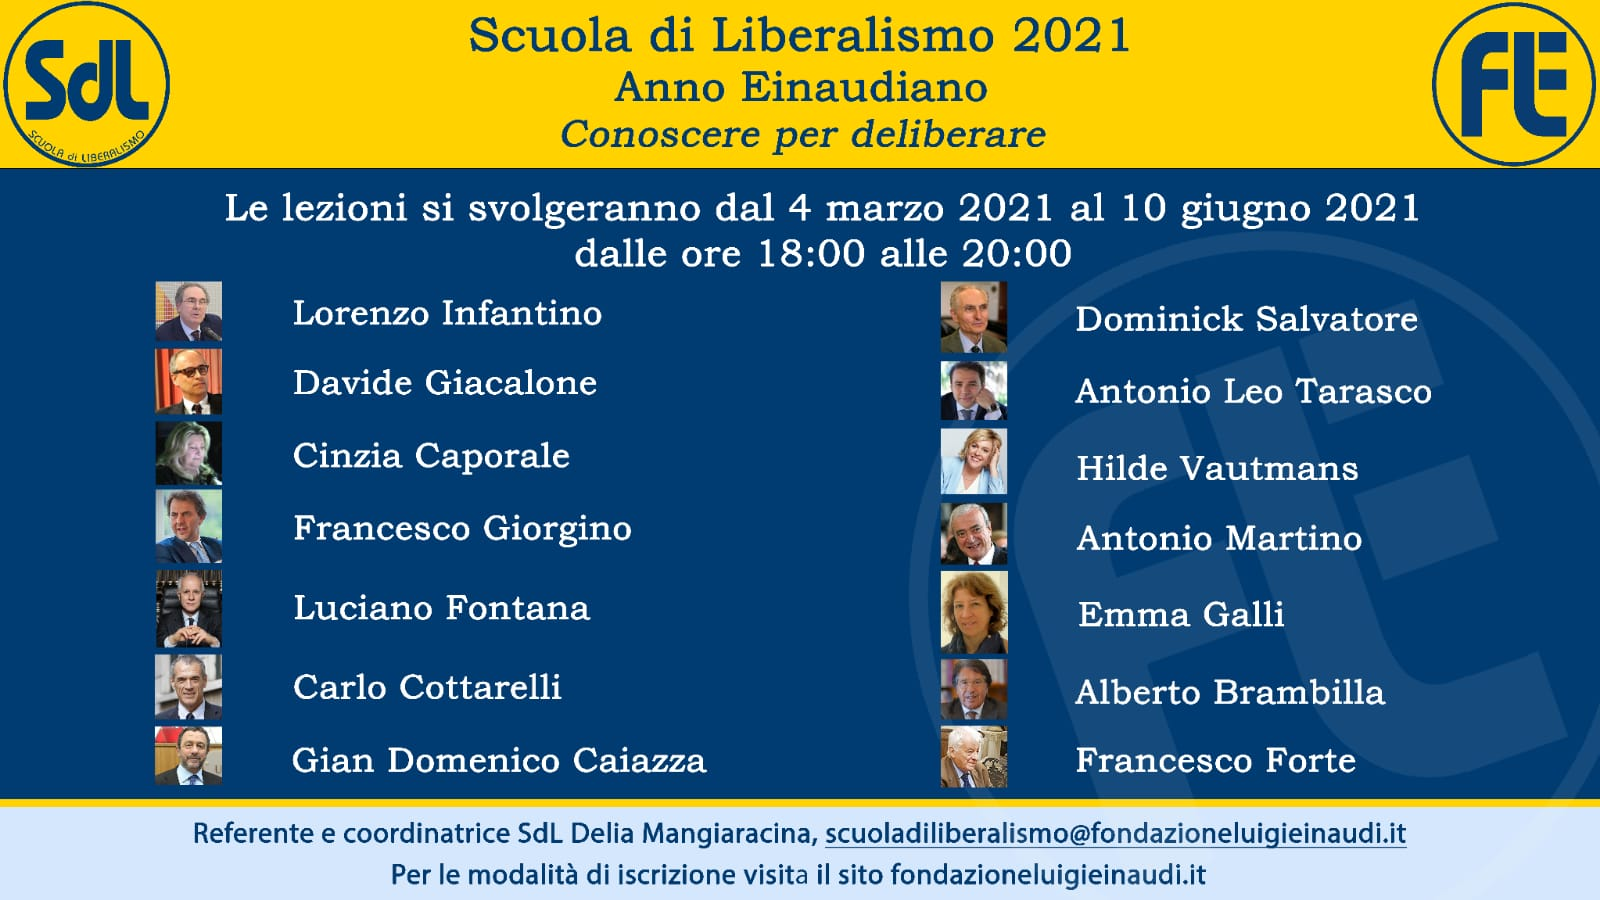 scuola di liberalismo Einaudi